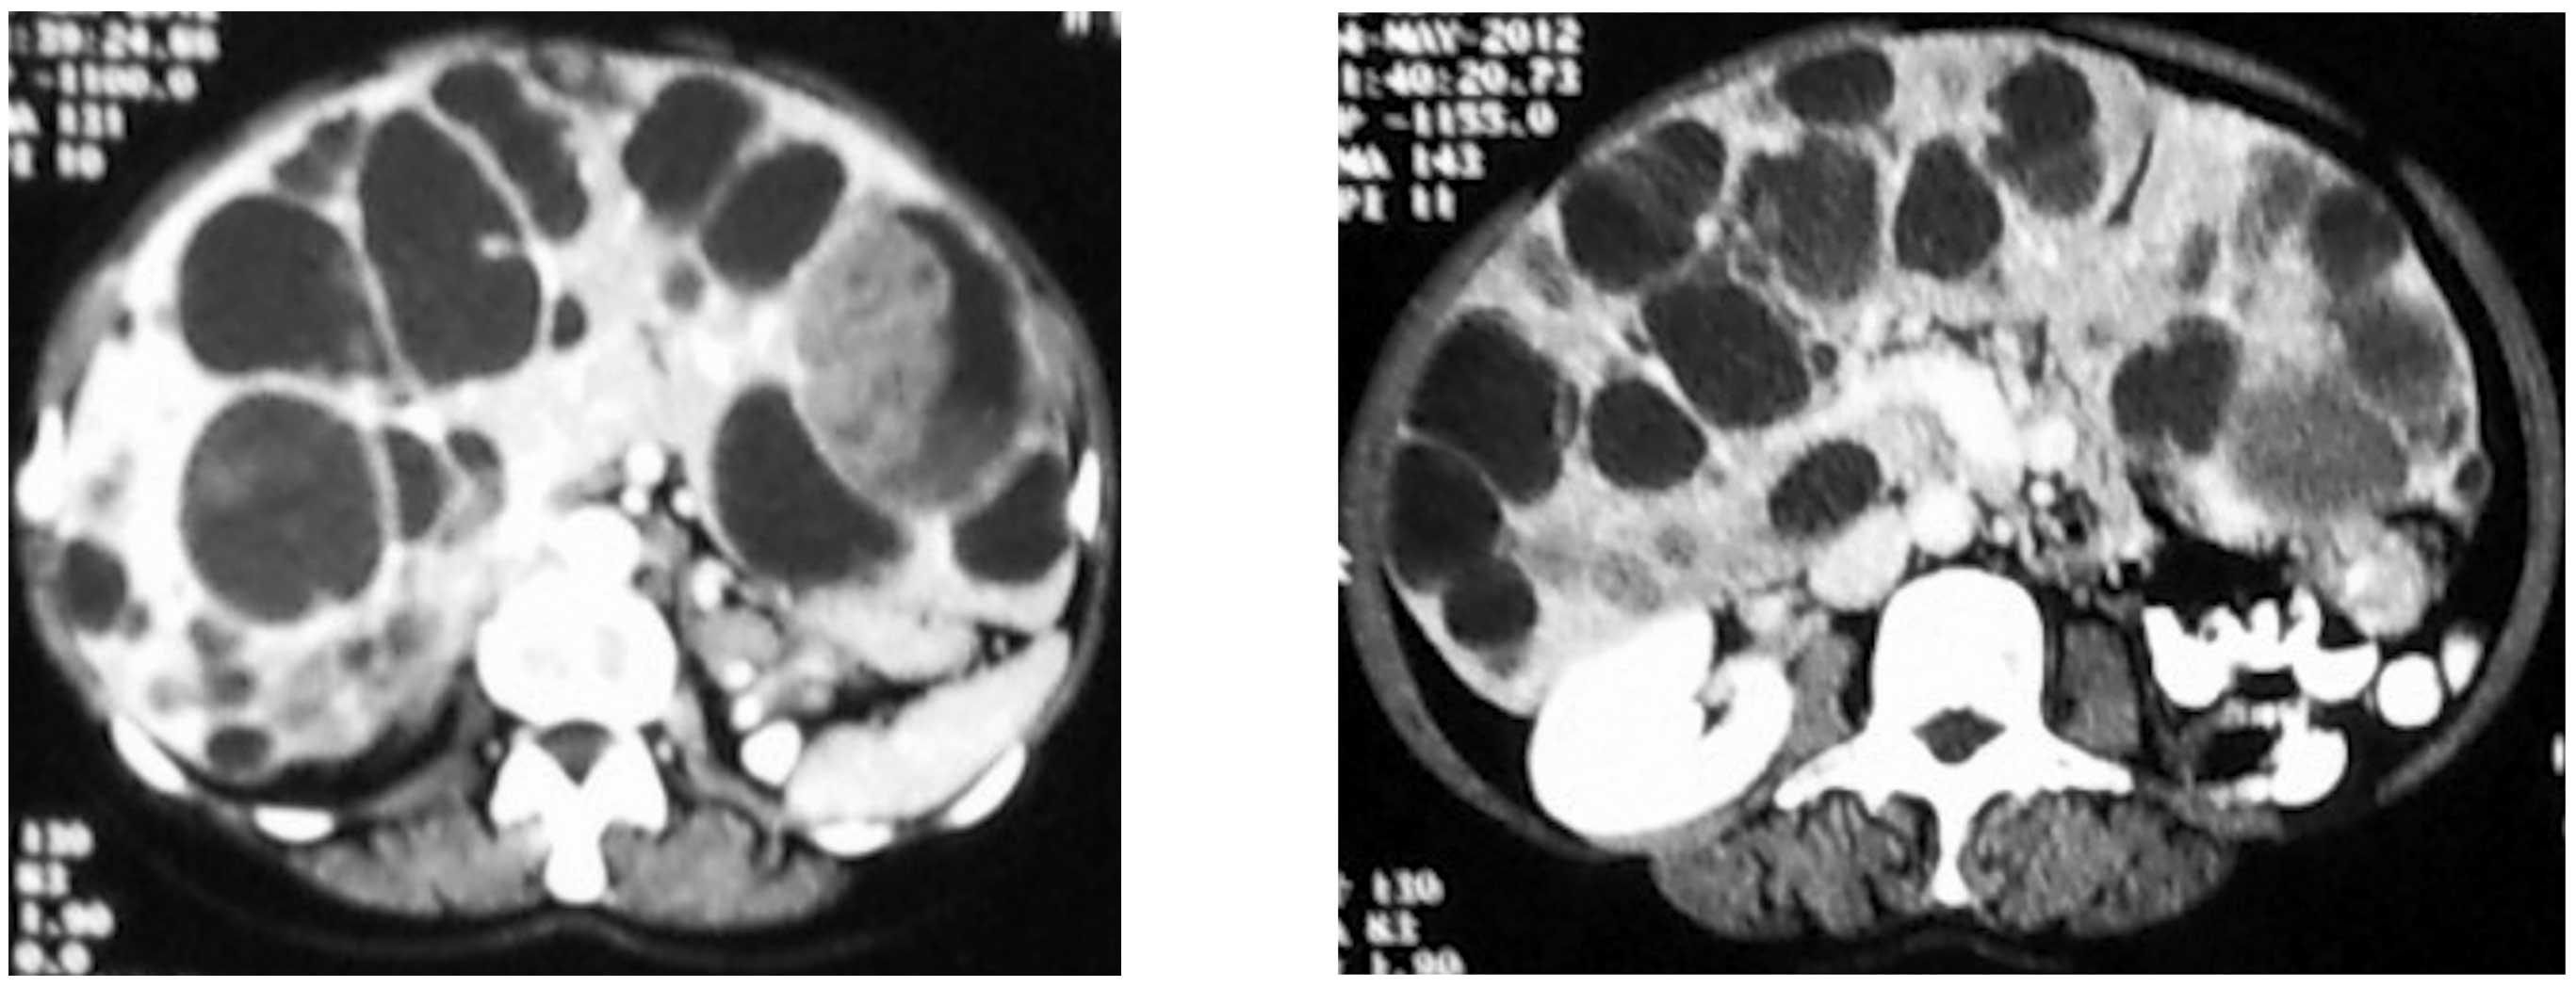 cervical cancer brown discharge